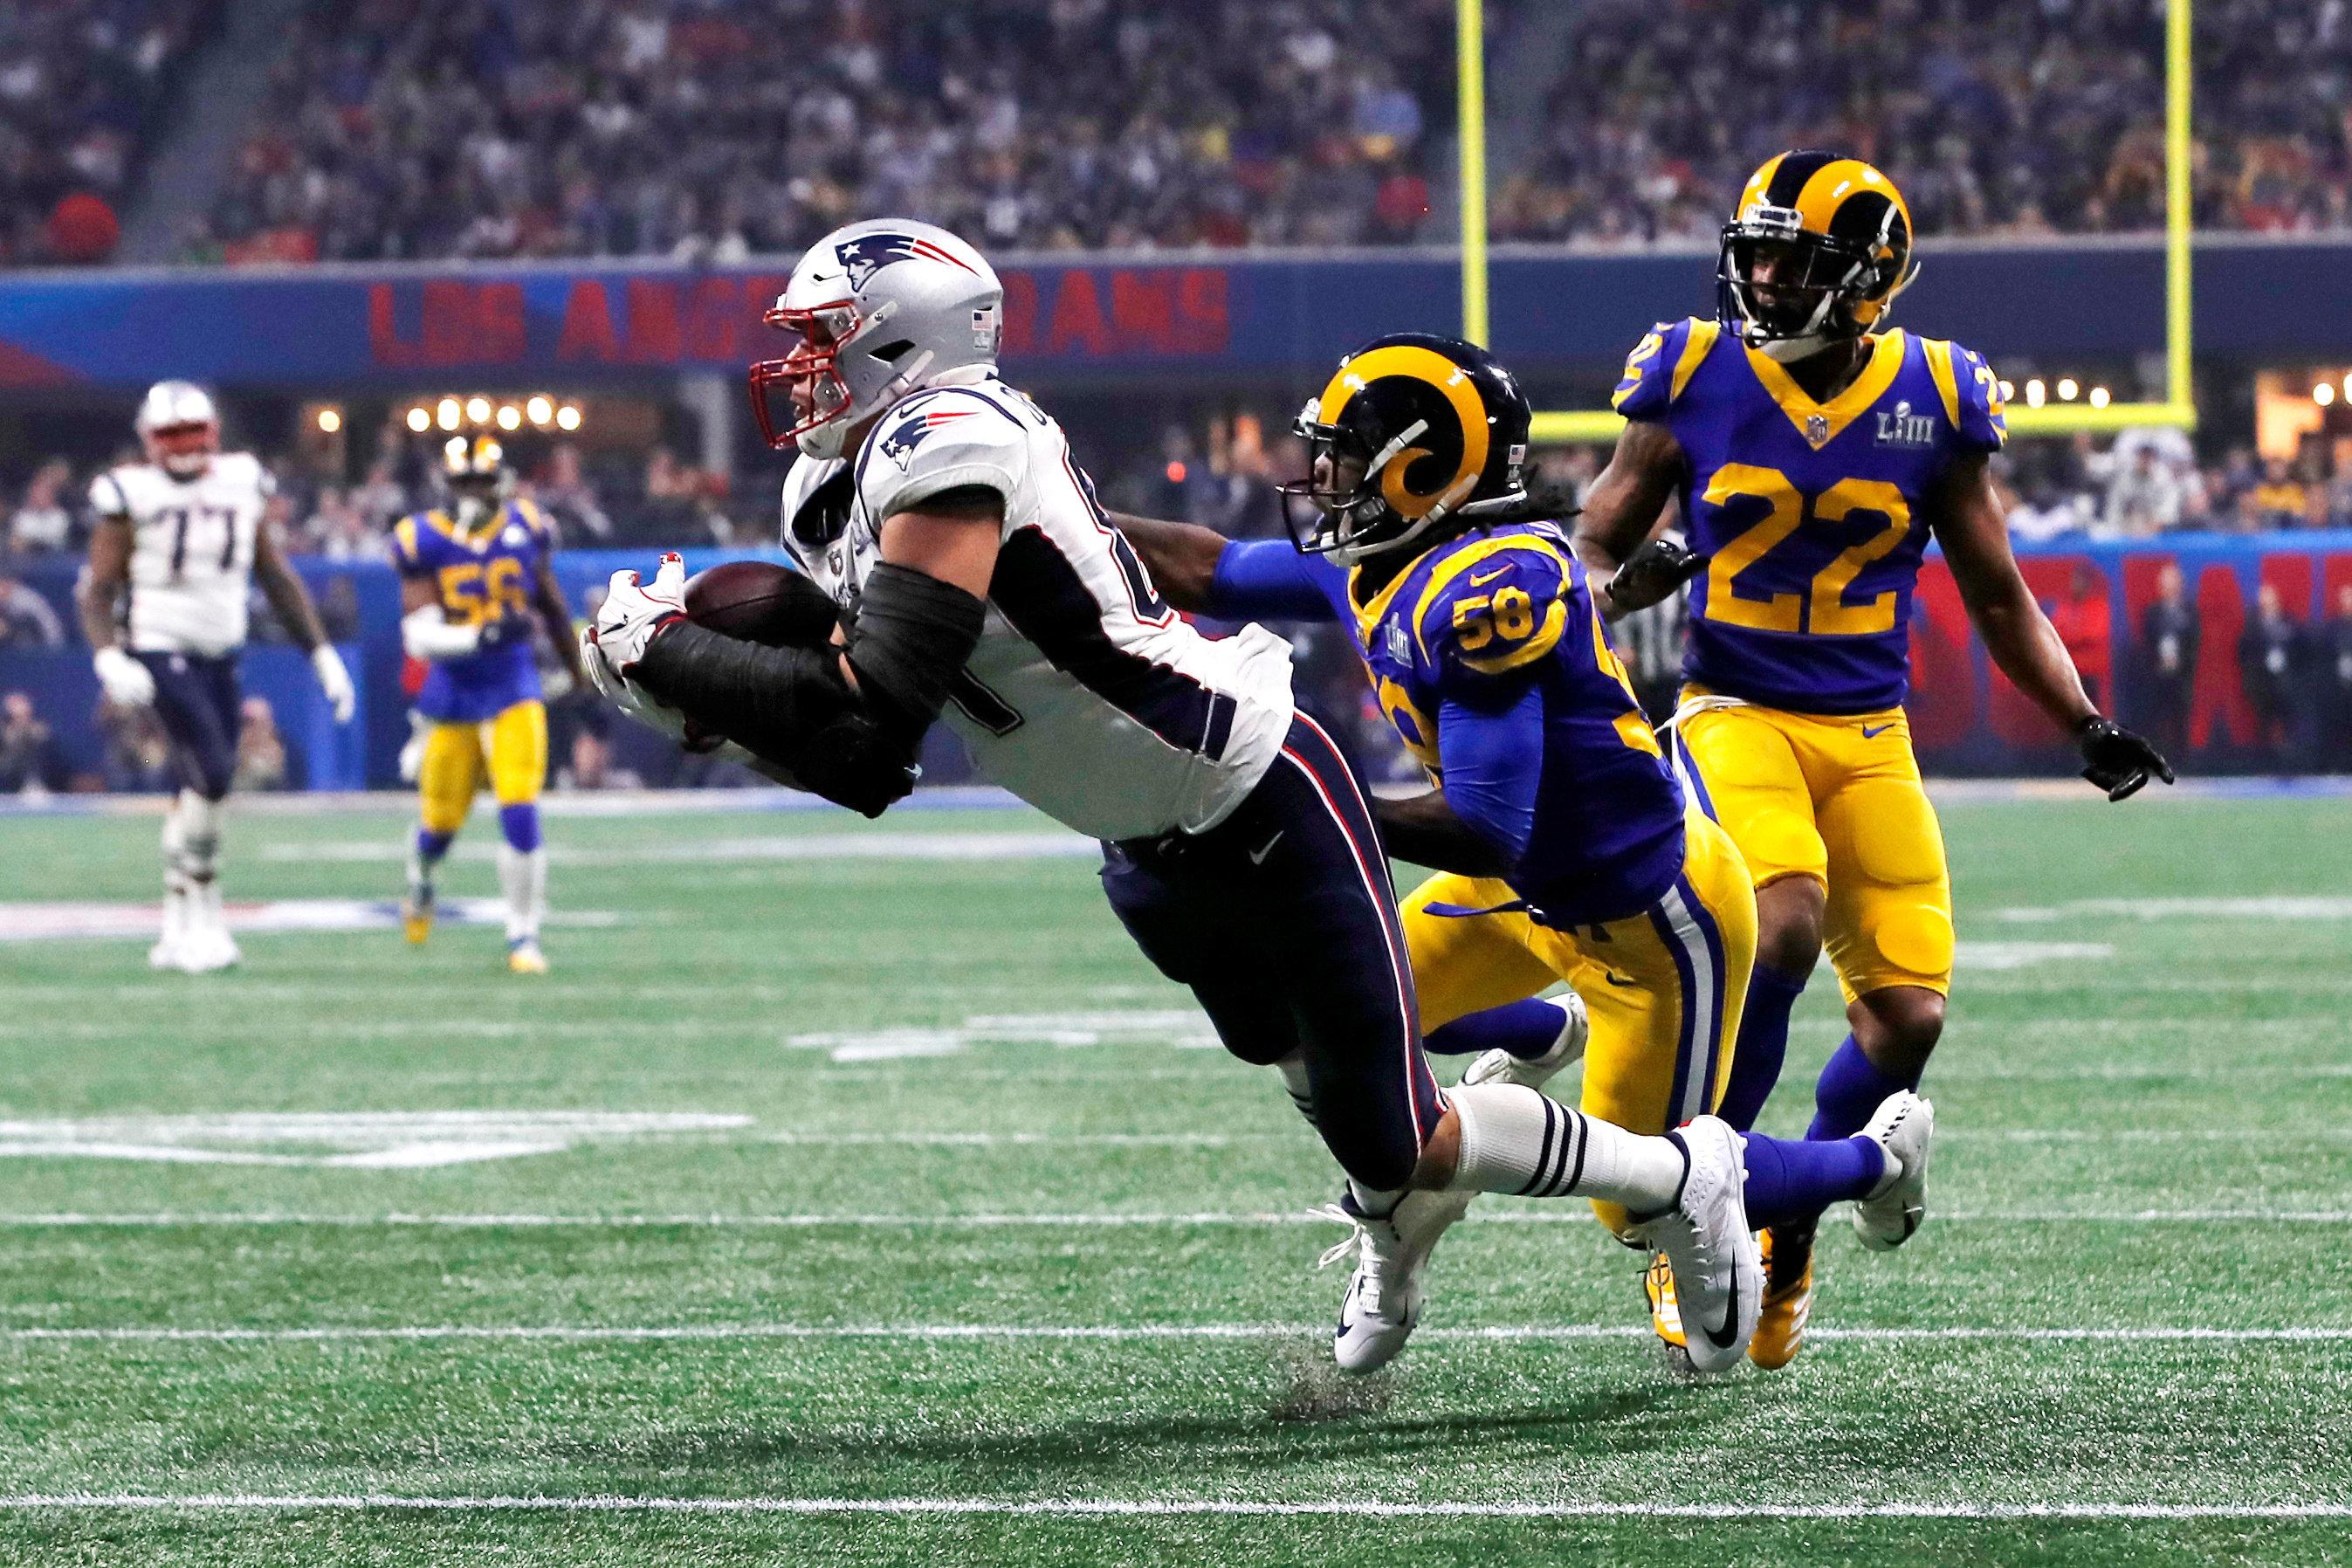 NFL Football - Super Bowl LIII - New England Patriots v Los Angeles Rams - Mercedes-Benz Stadium, Atlanta, Georgia, U.S. - February 3, 2019. New England Patriots' Rob Gronkowski makes a catch during the fourth quarter. REUTERS/Mike Segar